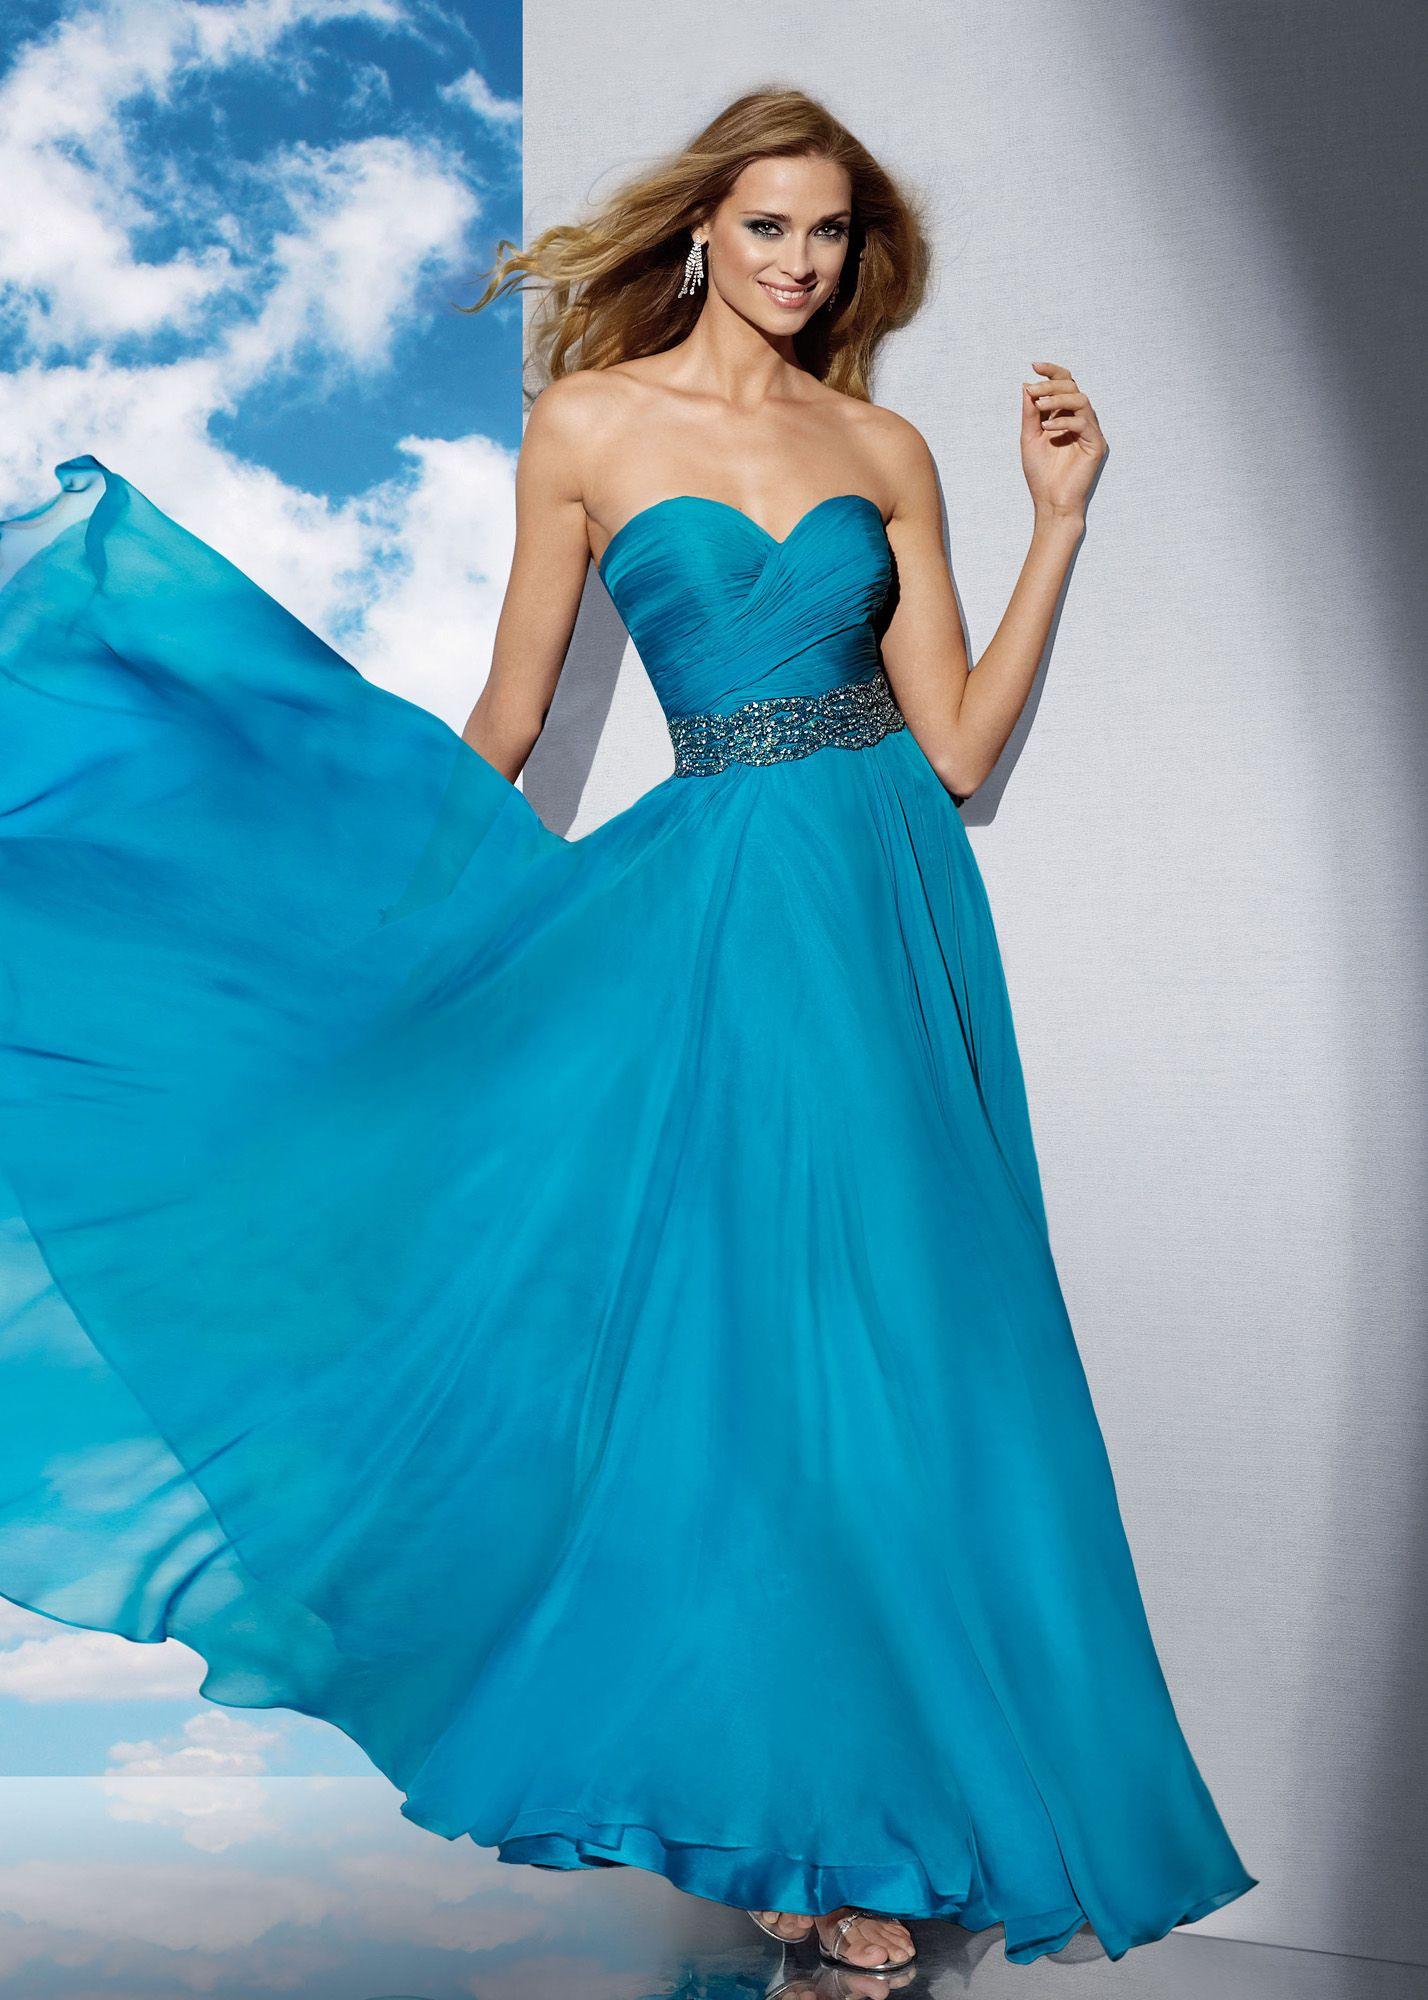 Impresiona a todos con este espectacular vestidodefiesta con